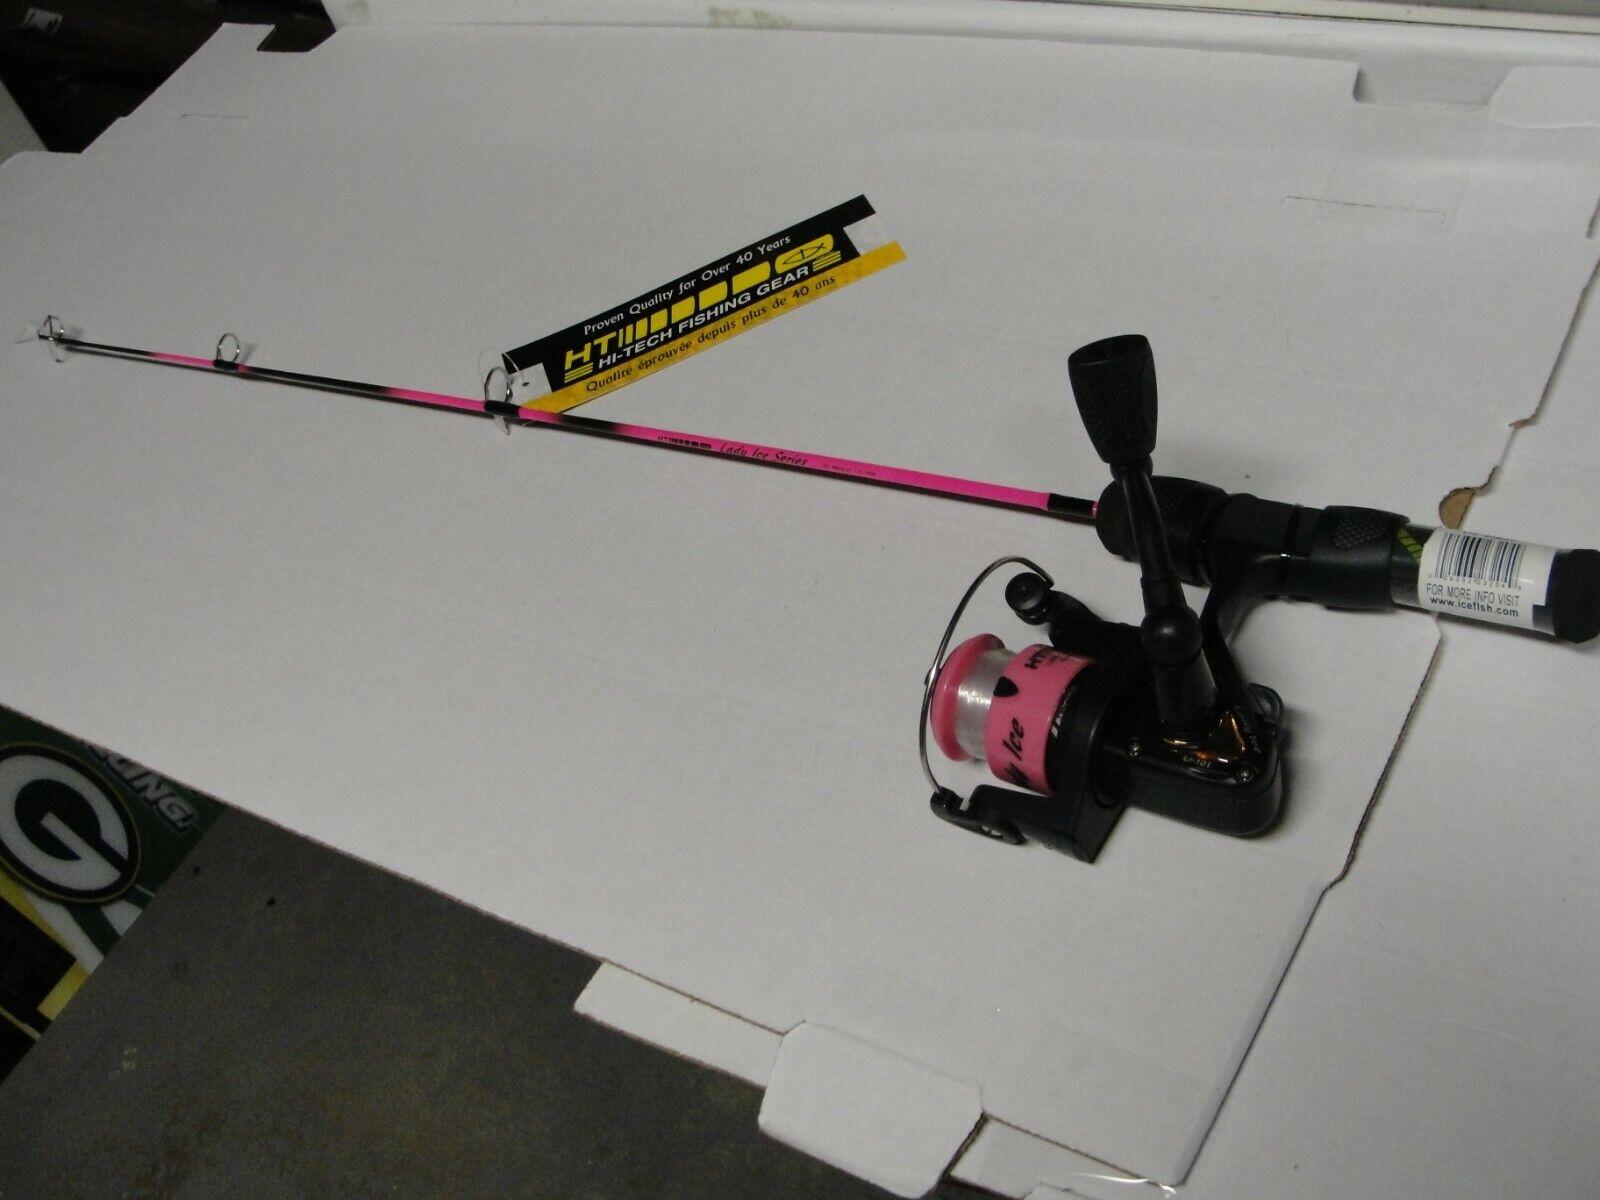 Lady Ice Series 25 Medium Action Ice Fishing Combo - $14.99